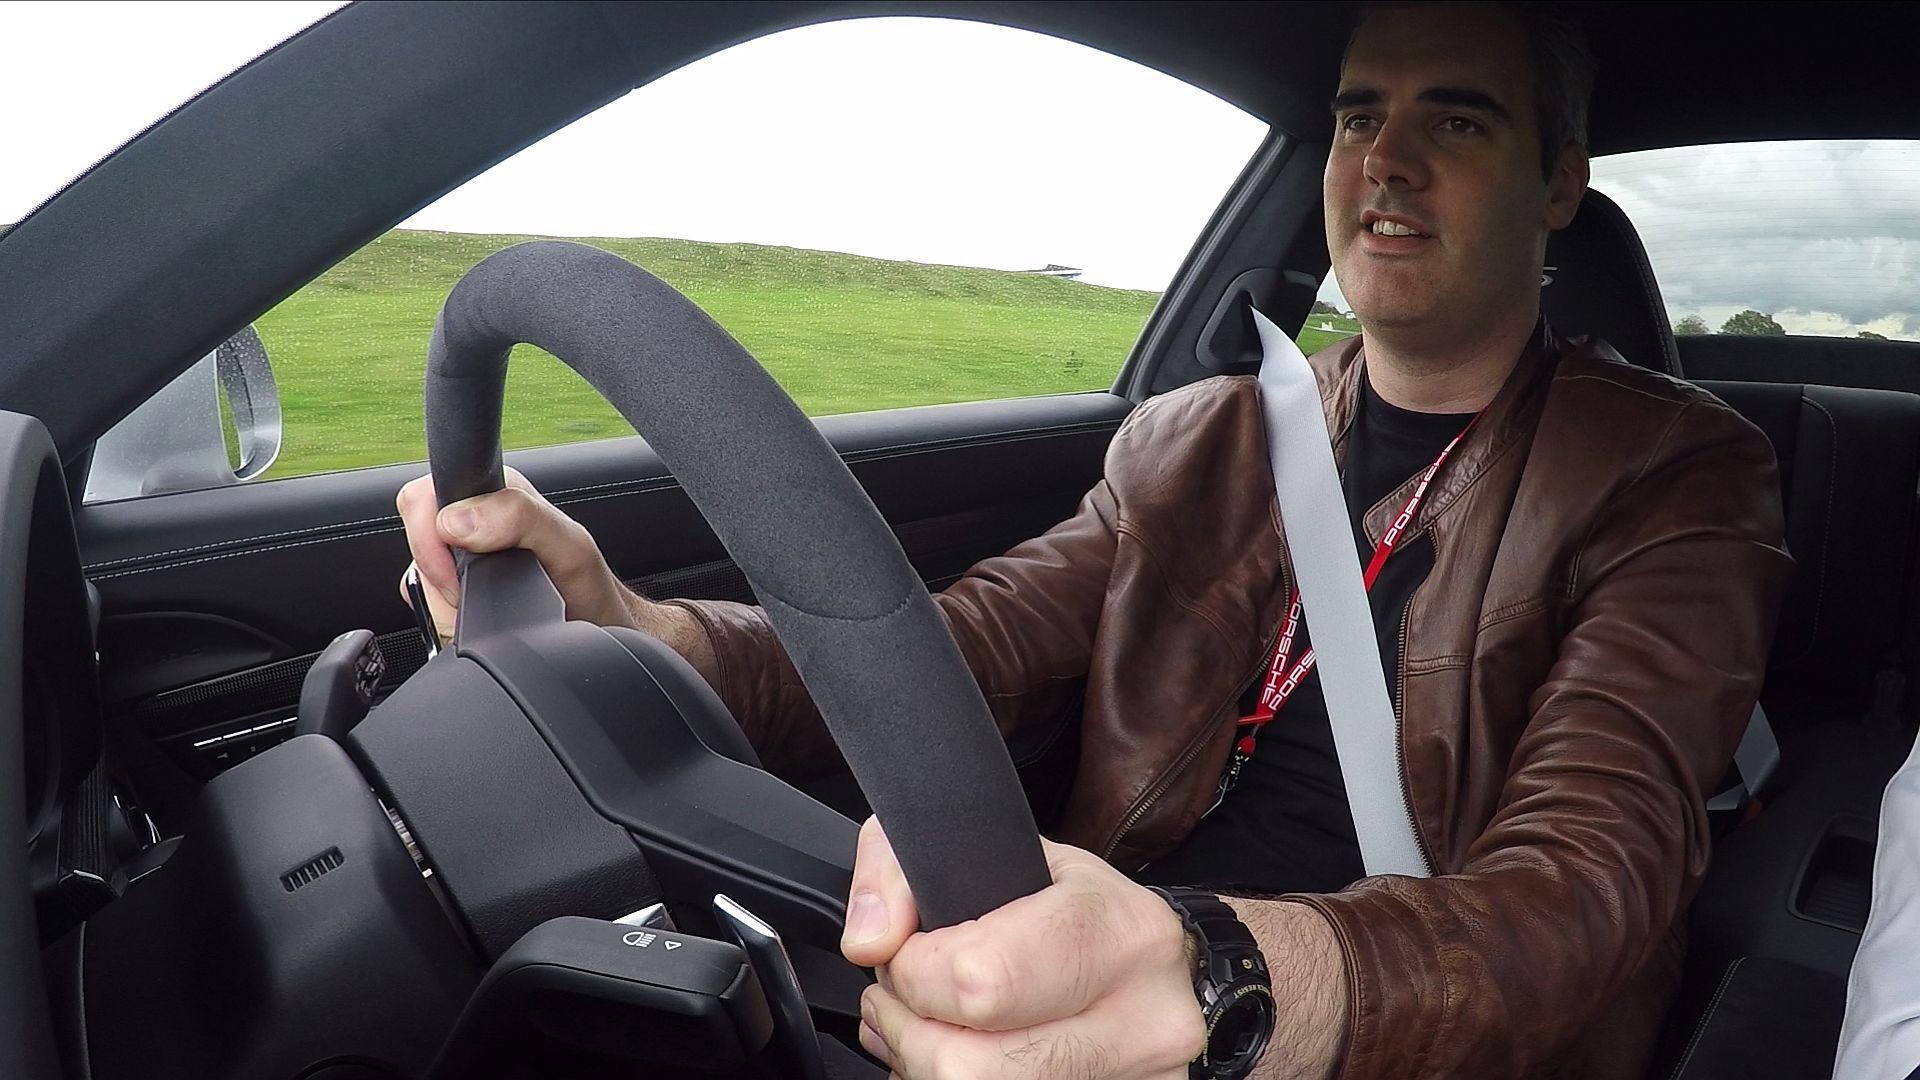 Forza 7 and Porsche Experience Centre testing a 911